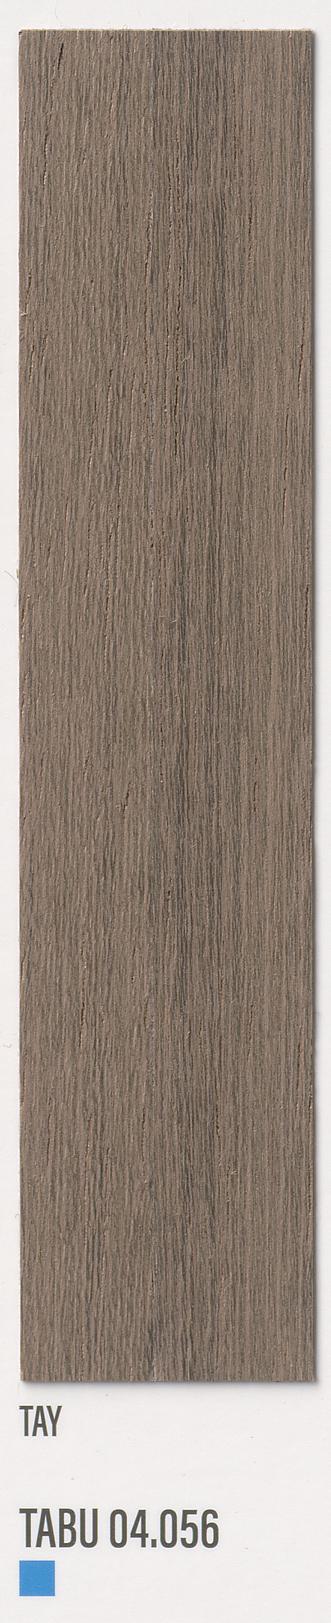 H74-(300dpi)(20181031)